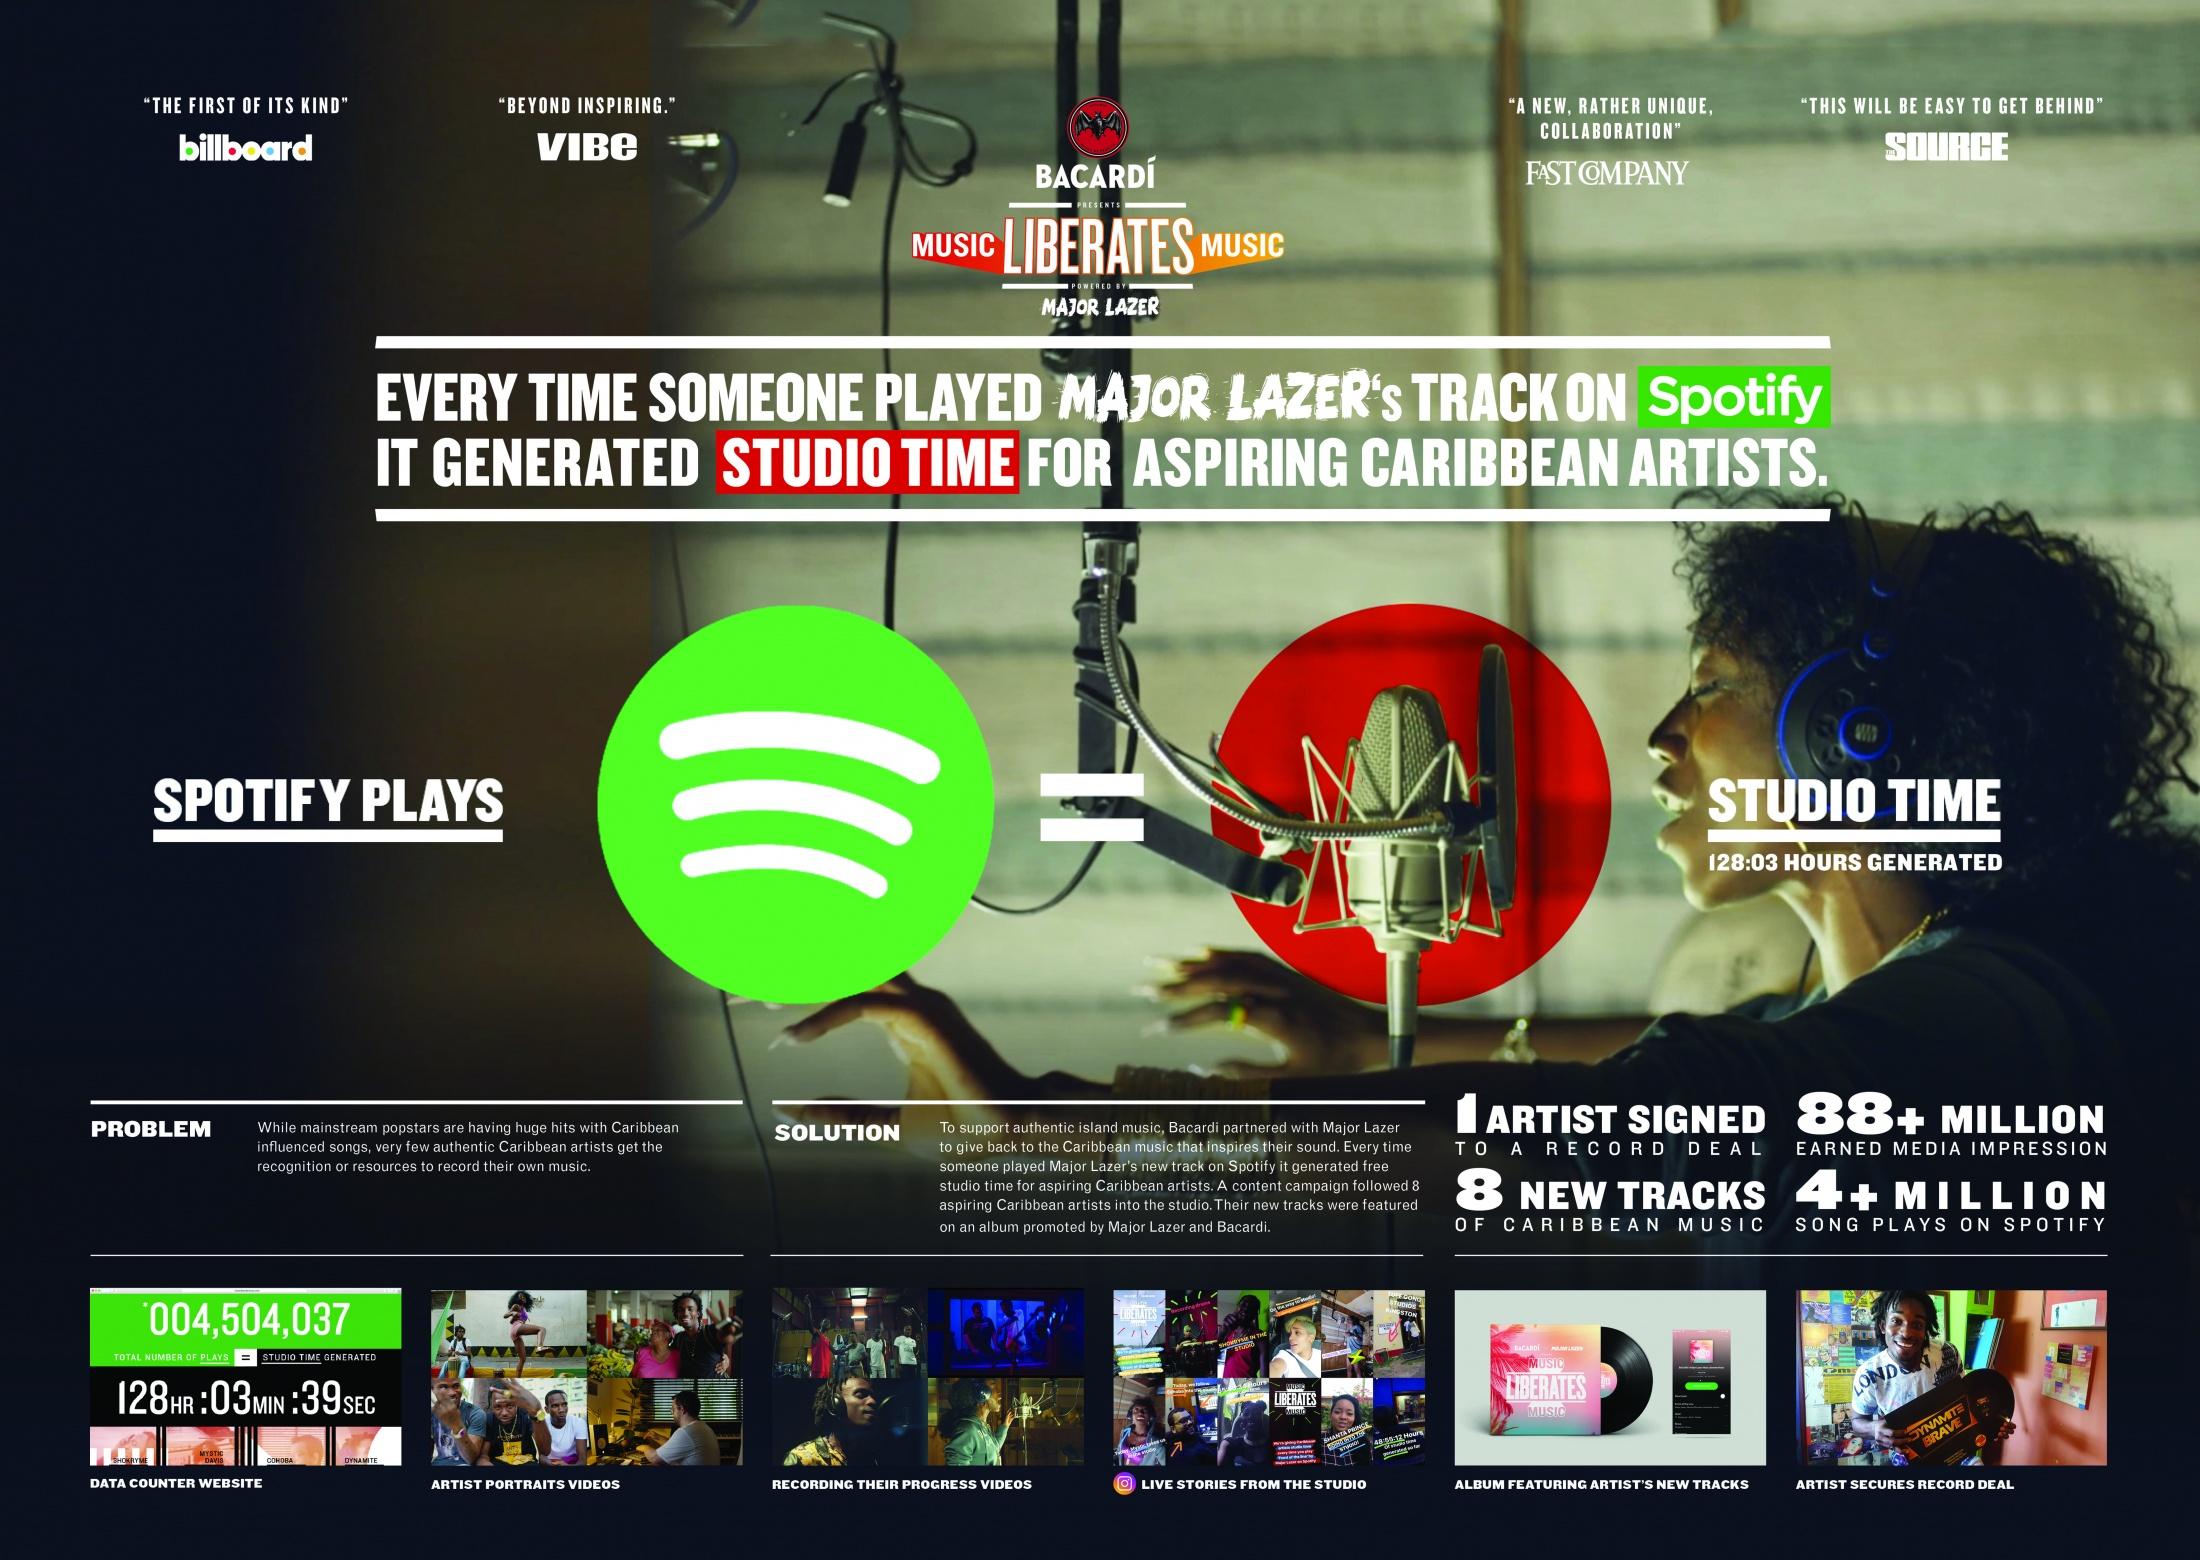 Thumbnail for Music Liberates Music